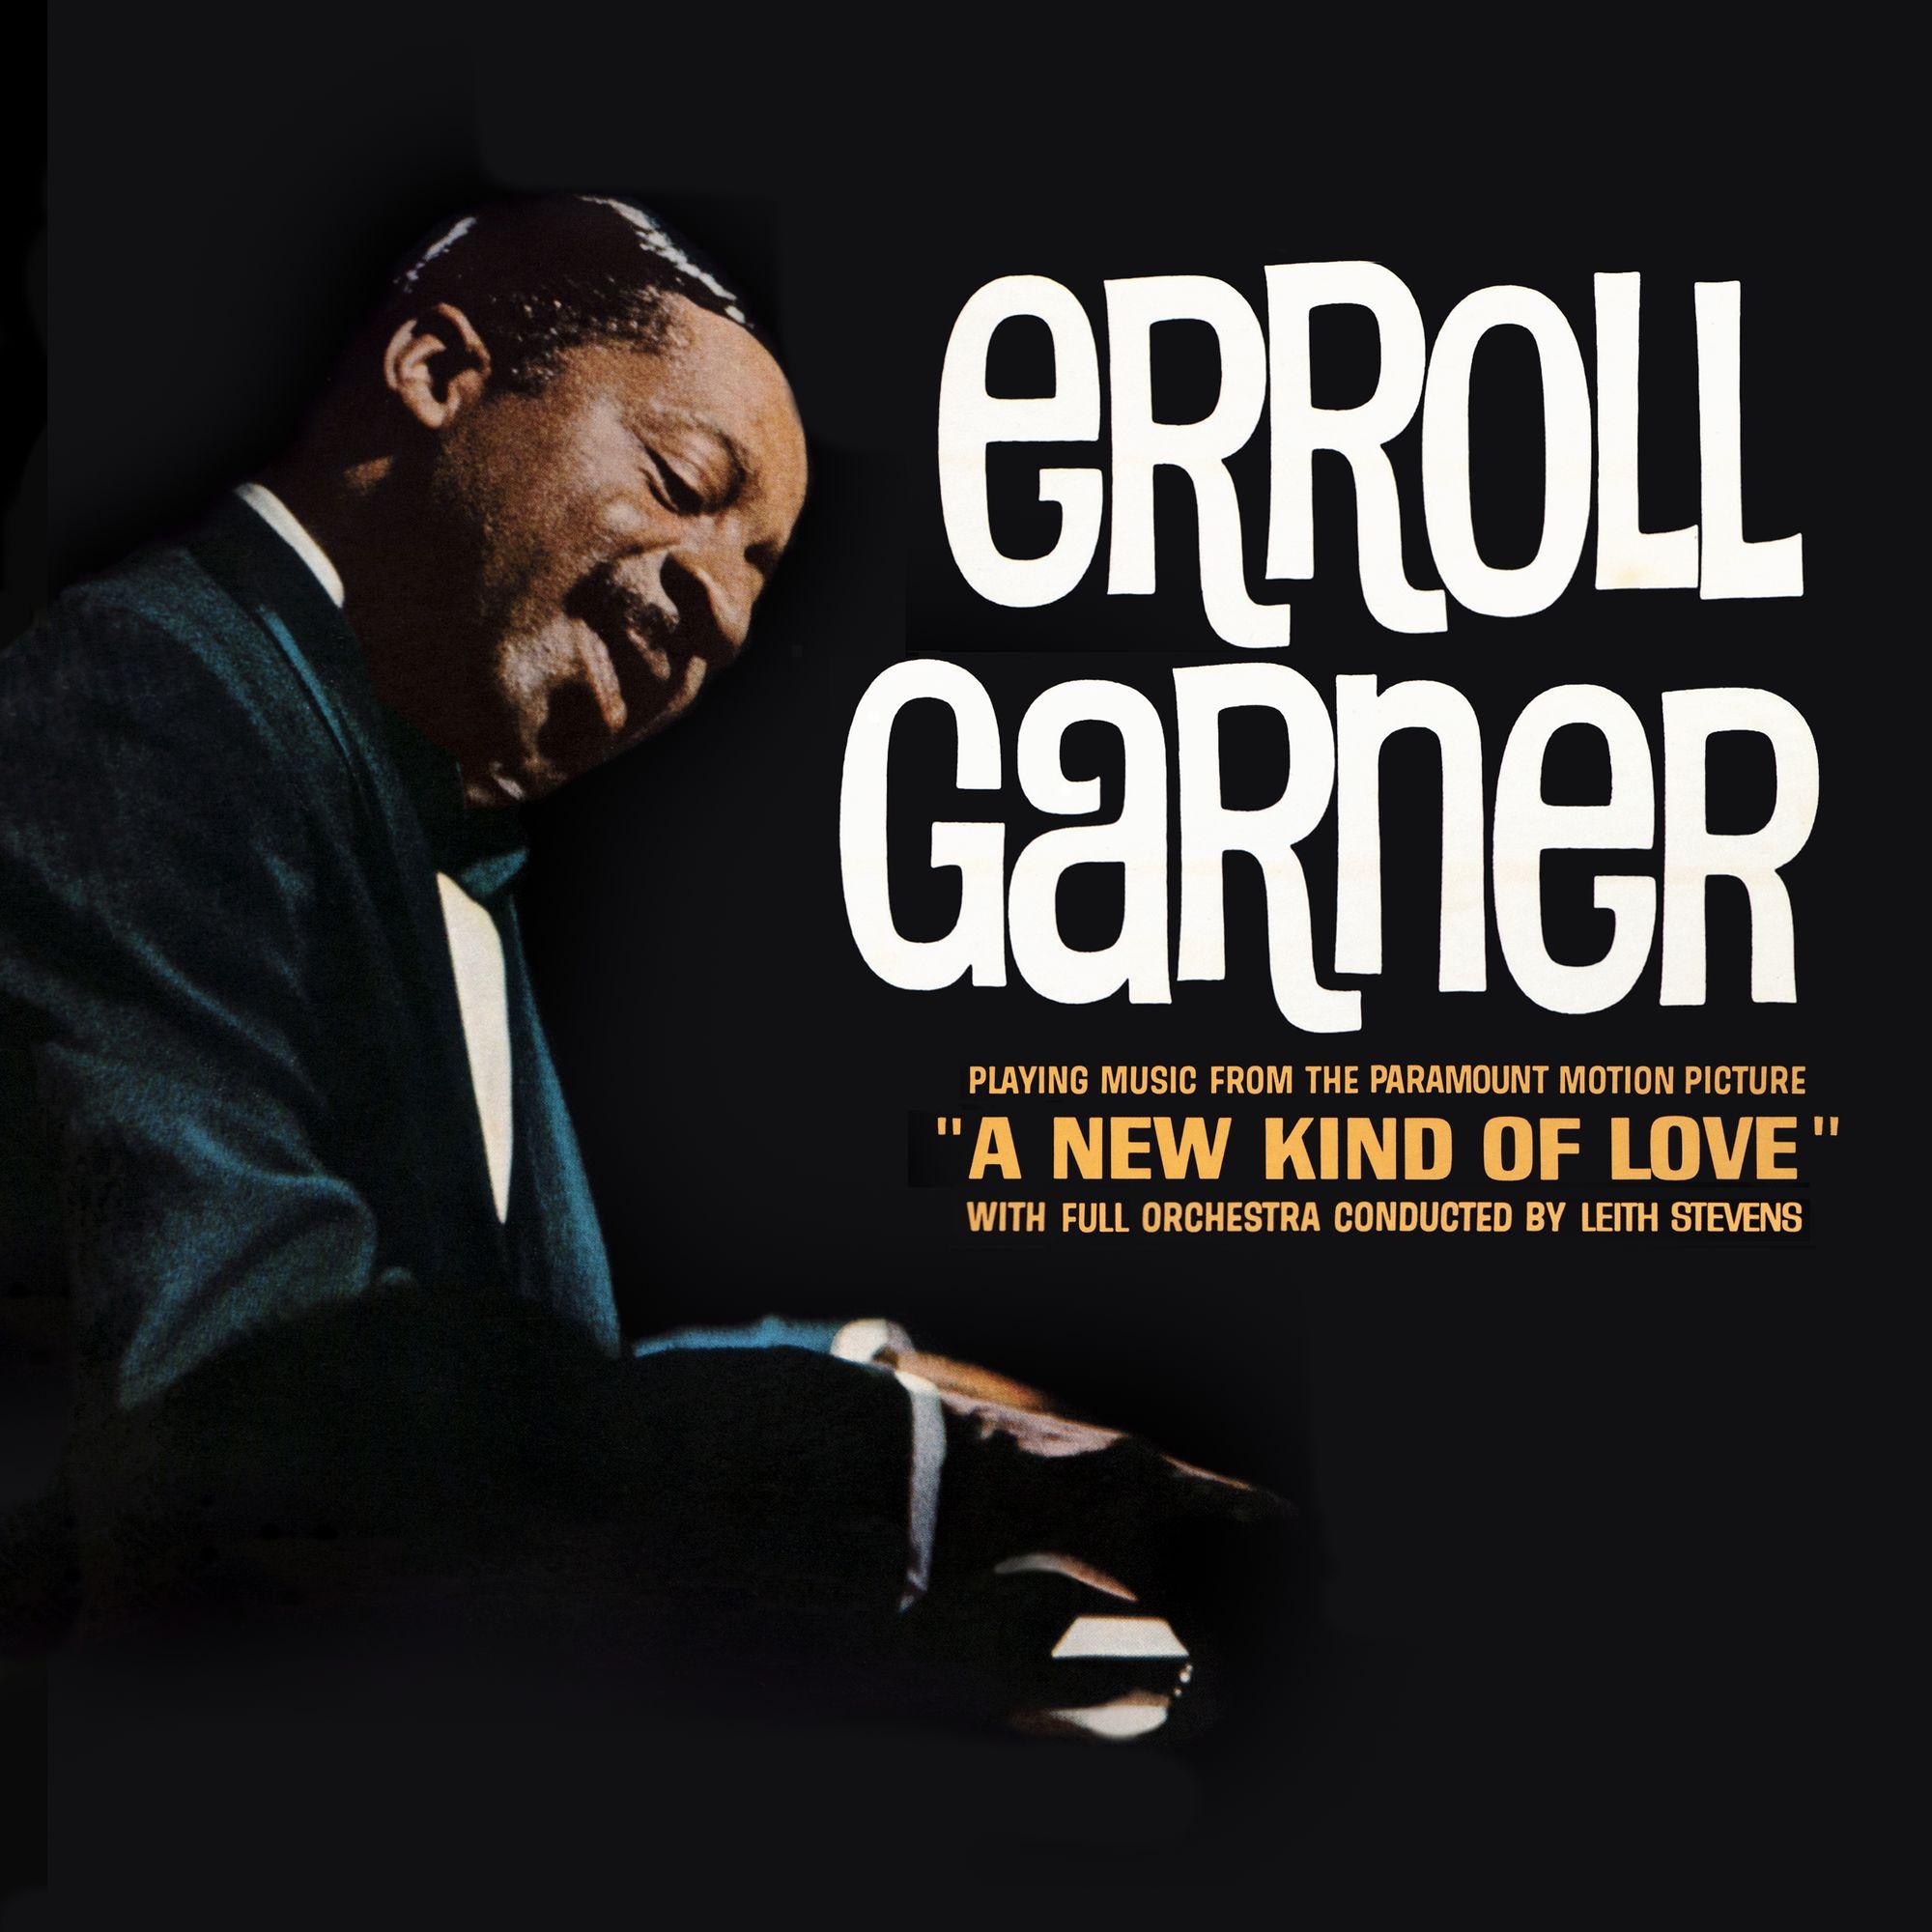 Erroll Garner - A New Kind Of Love (Remastered)